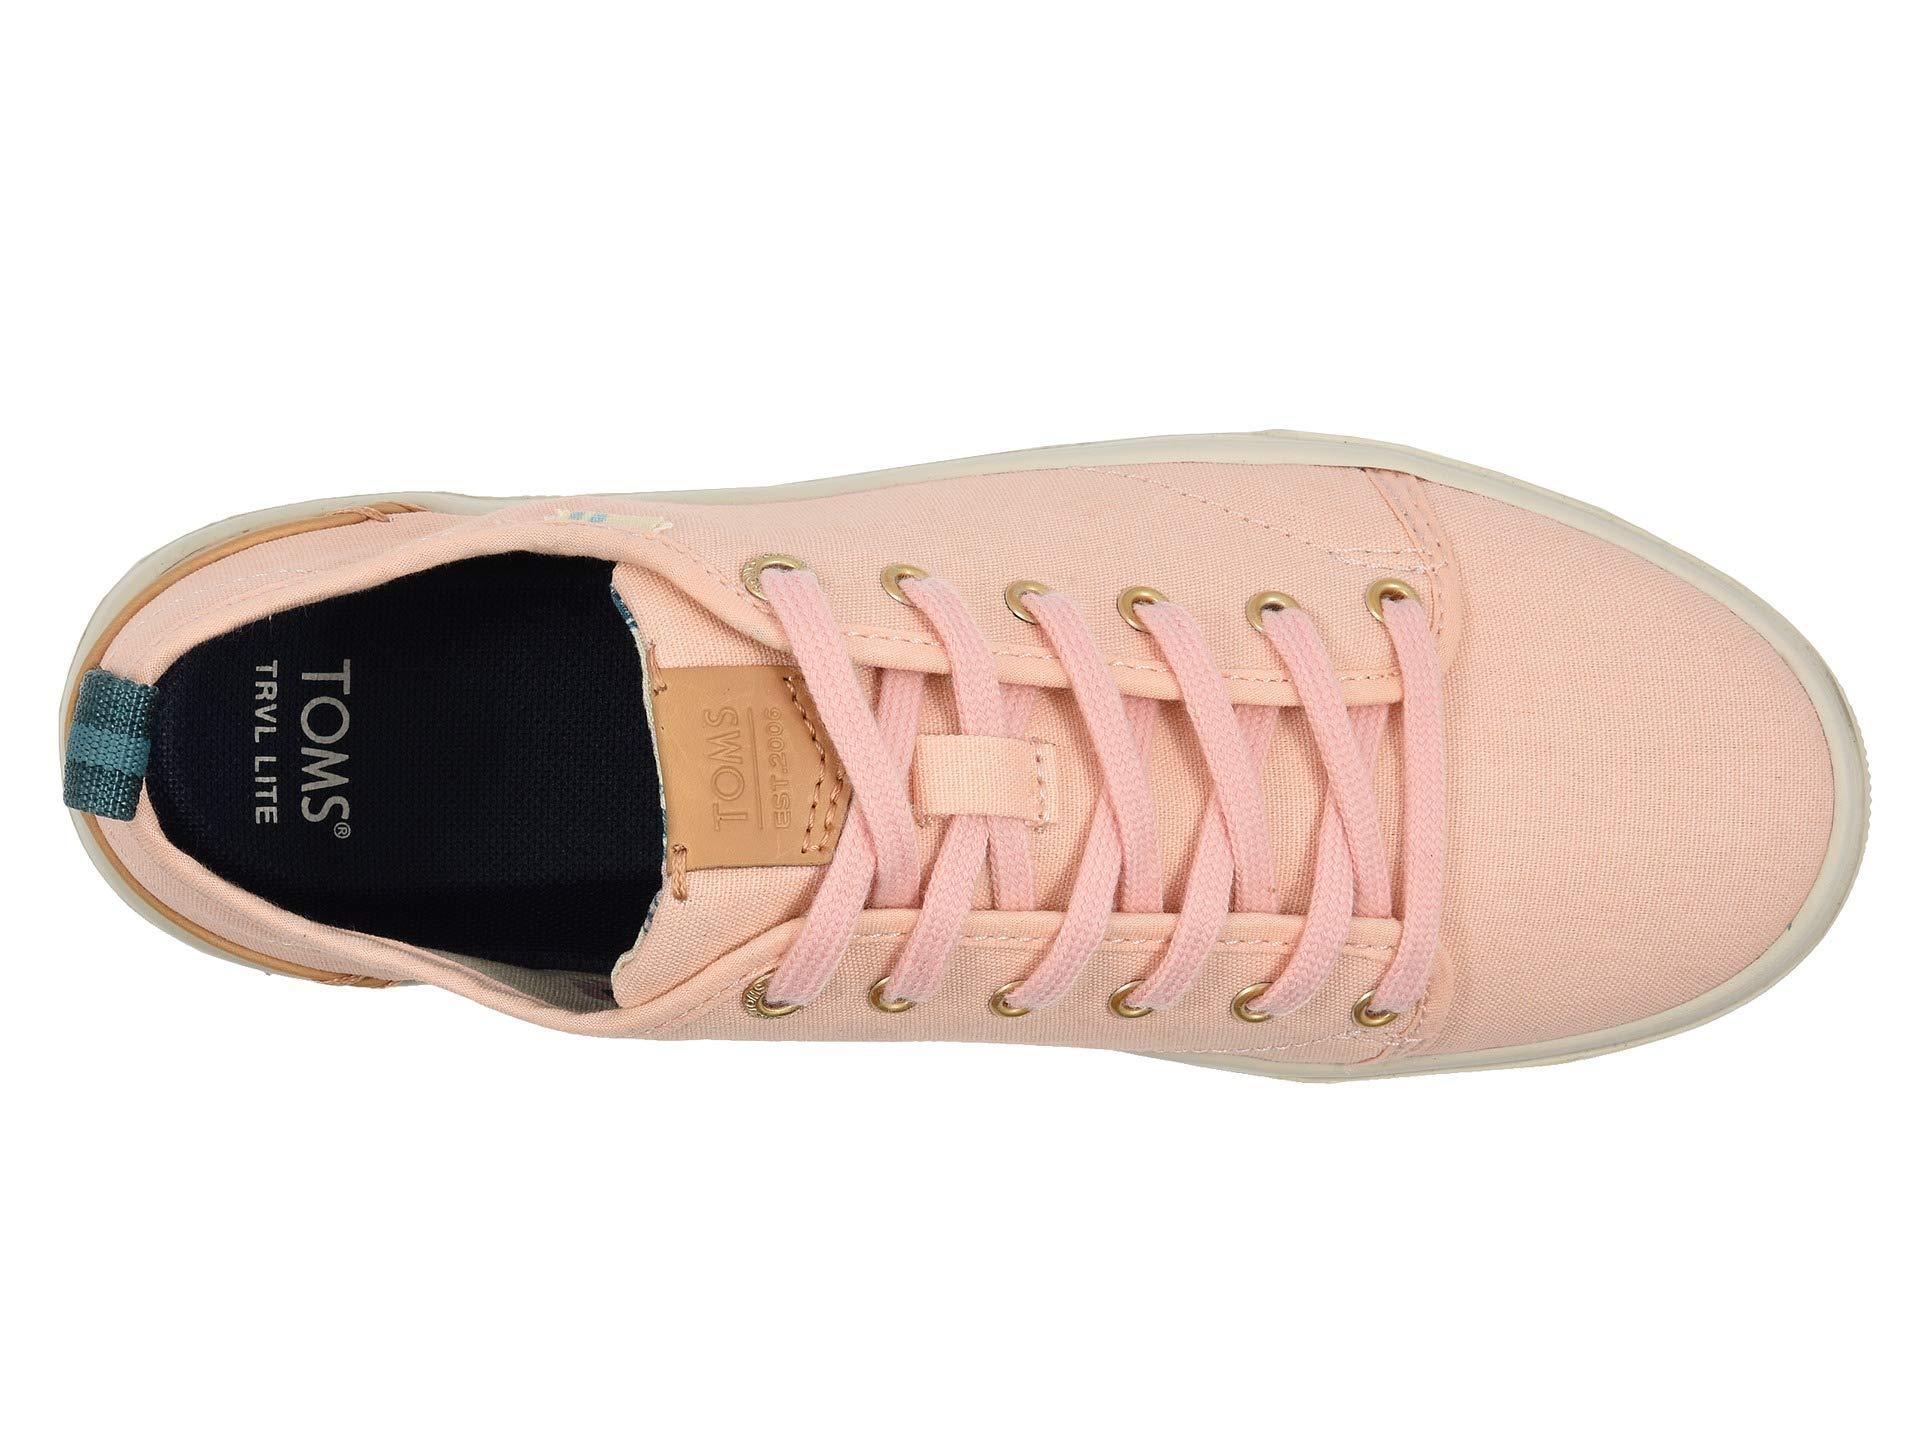 1e69e8fefb4 TOMS - Pink Trvl Lite Low (birch Canvas) Women s Shoes - Lyst. View  fullscreen